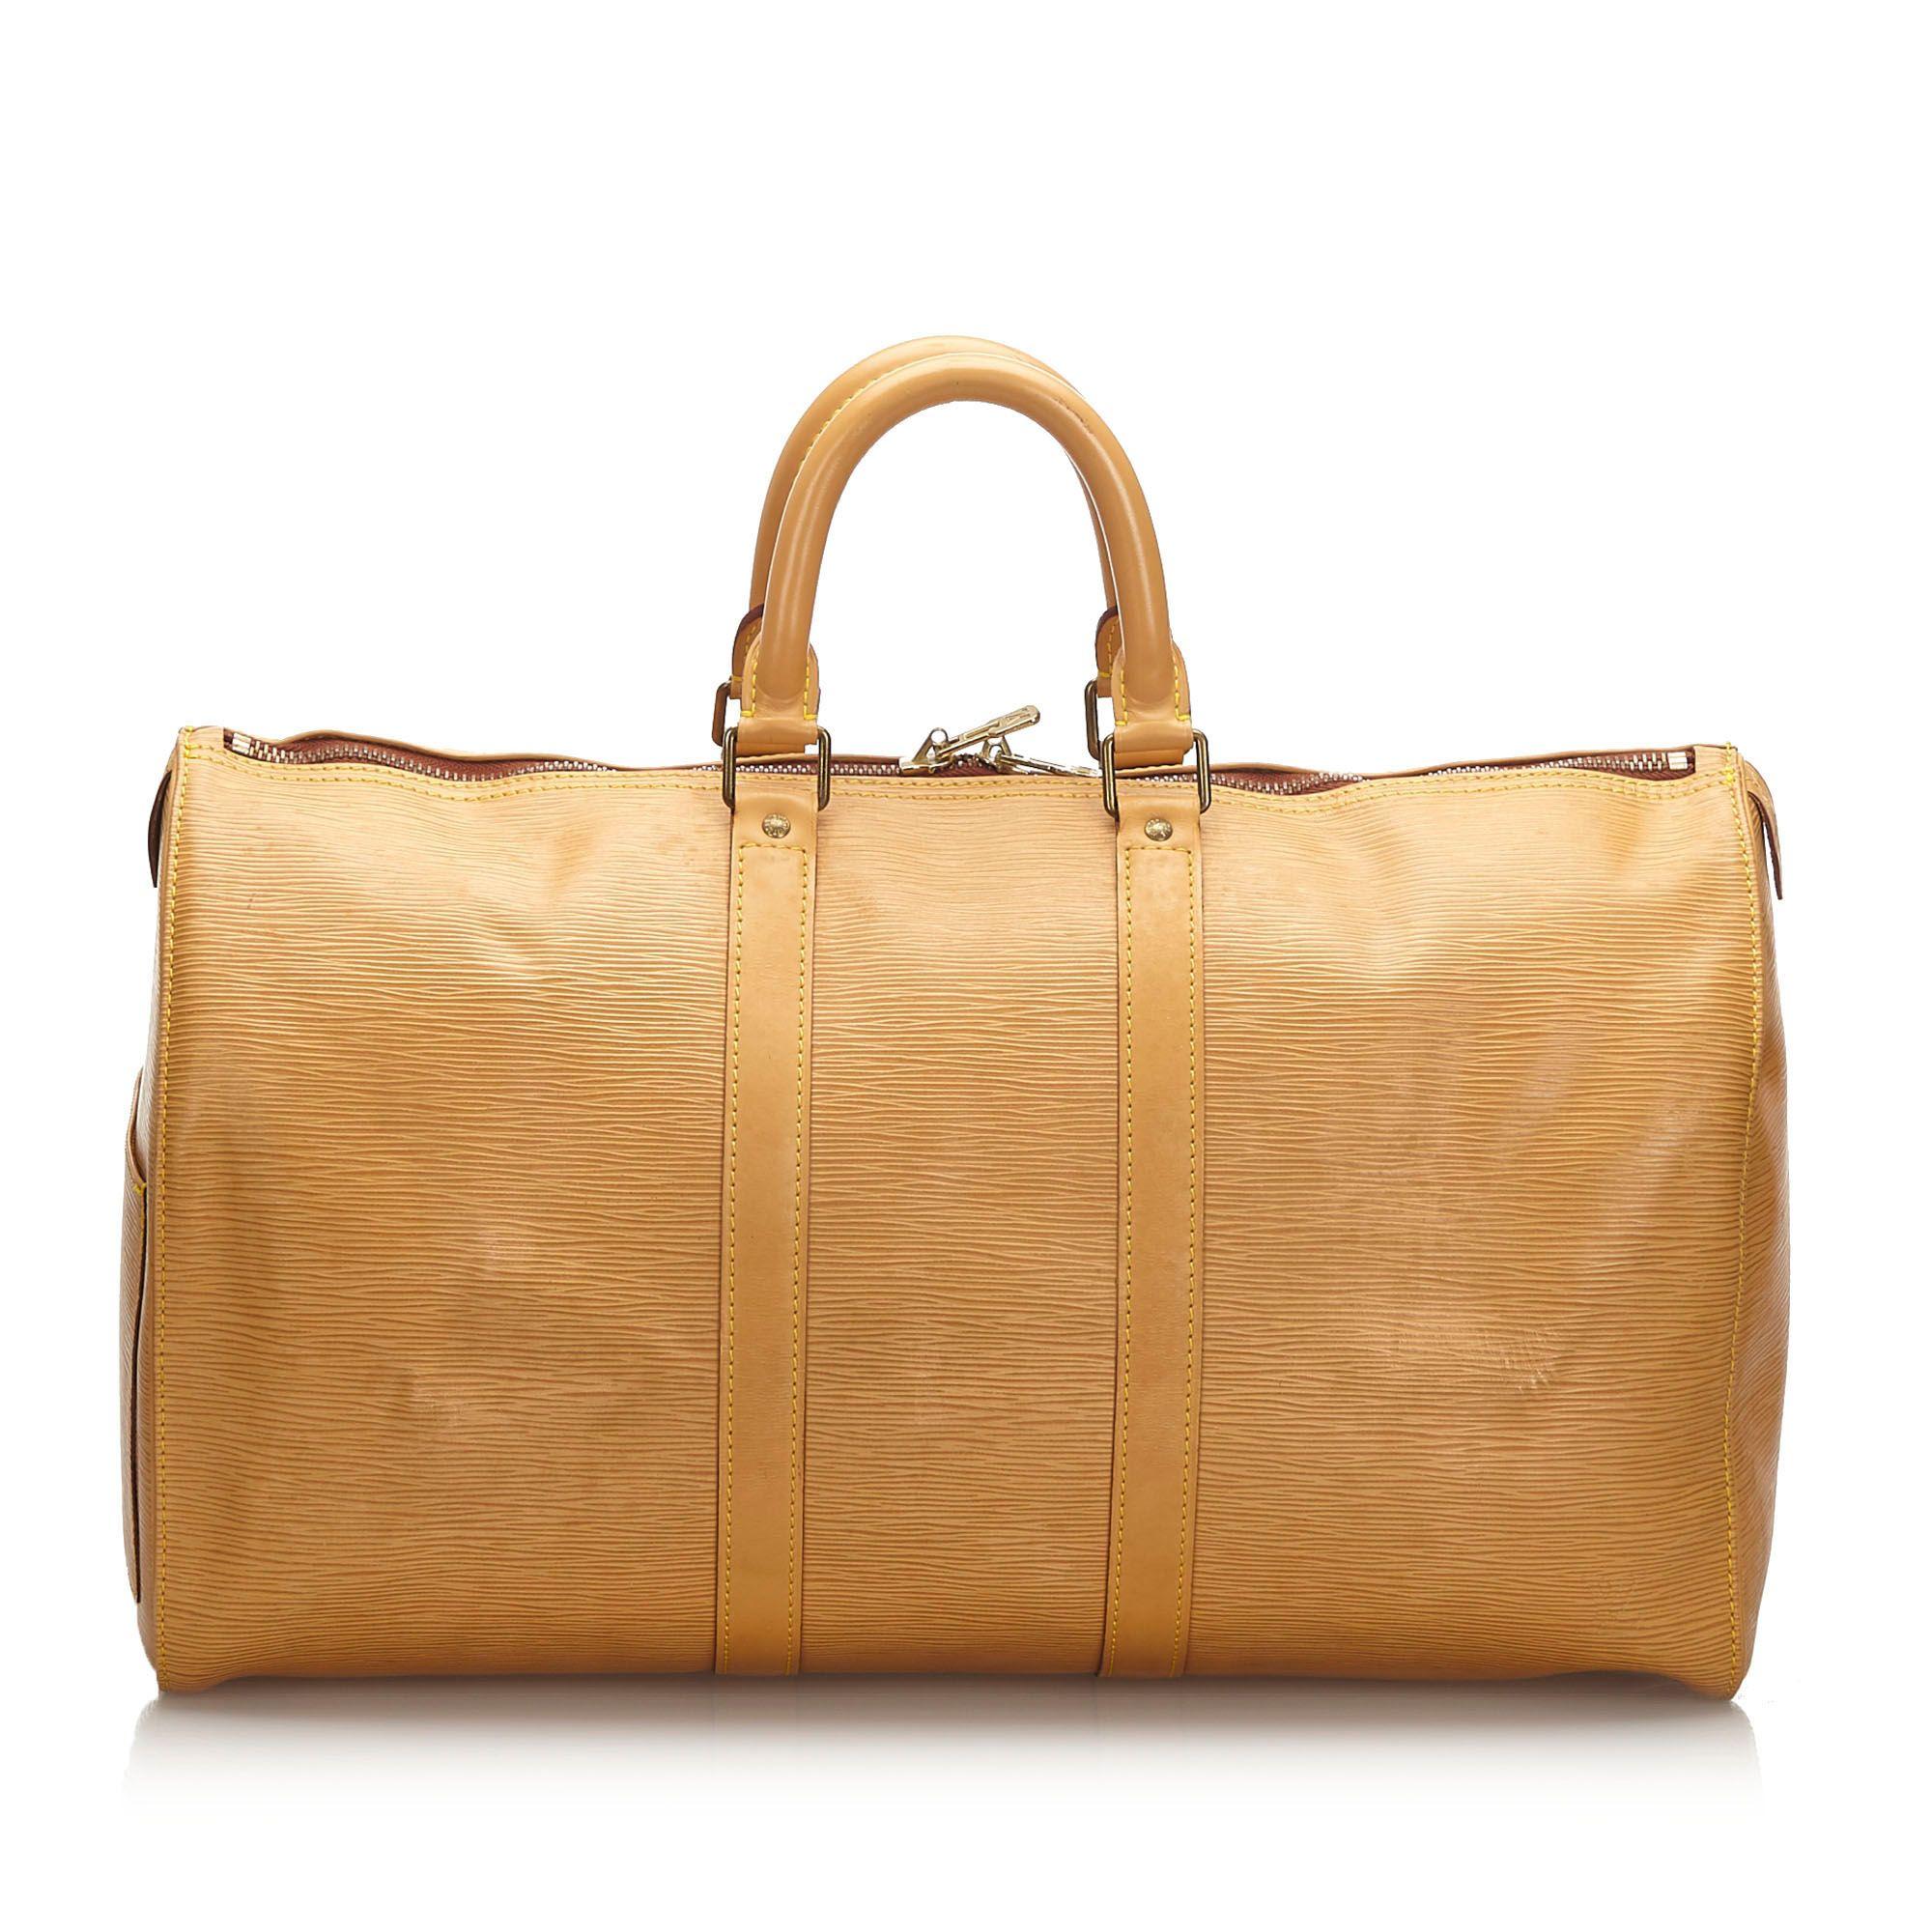 Vintage Louis Vuitton Epi Keepall 45 Brown